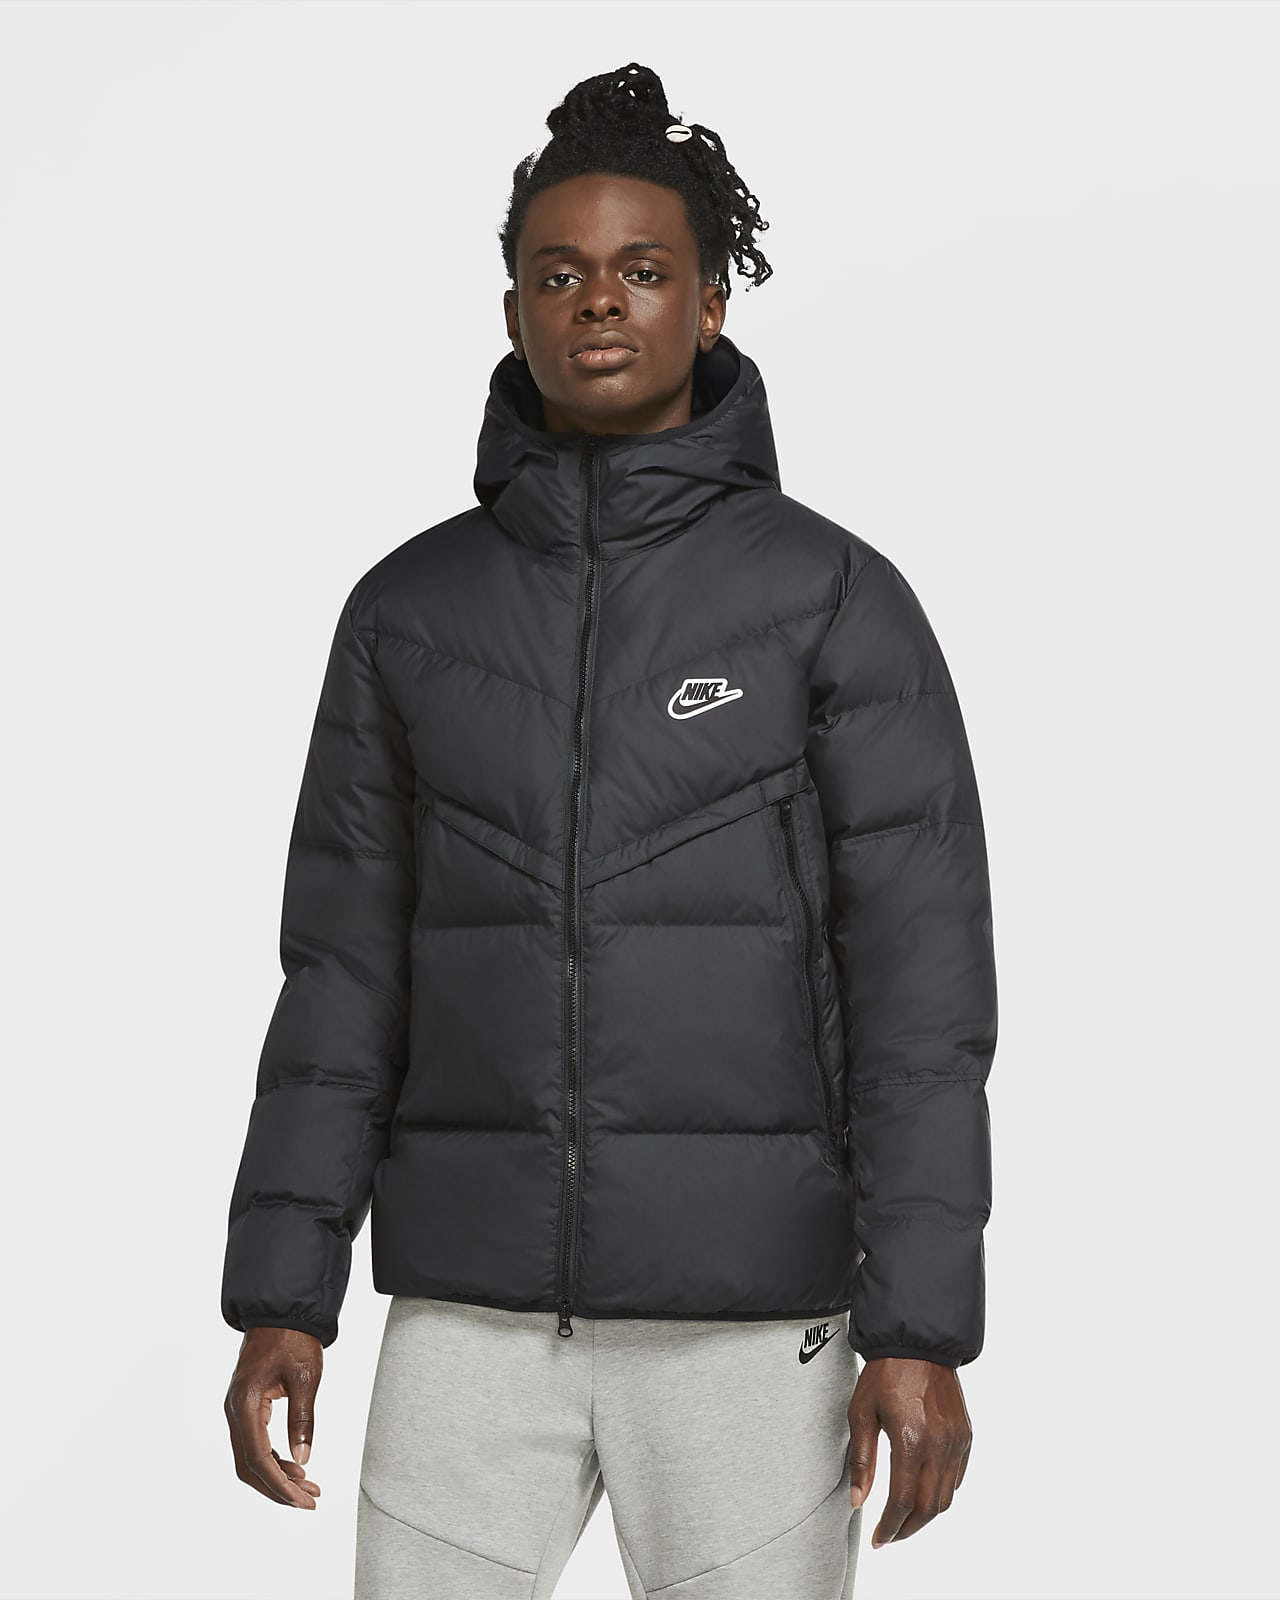 Giacca Nike Sportswear Down-Fill Windrunner - Uomo